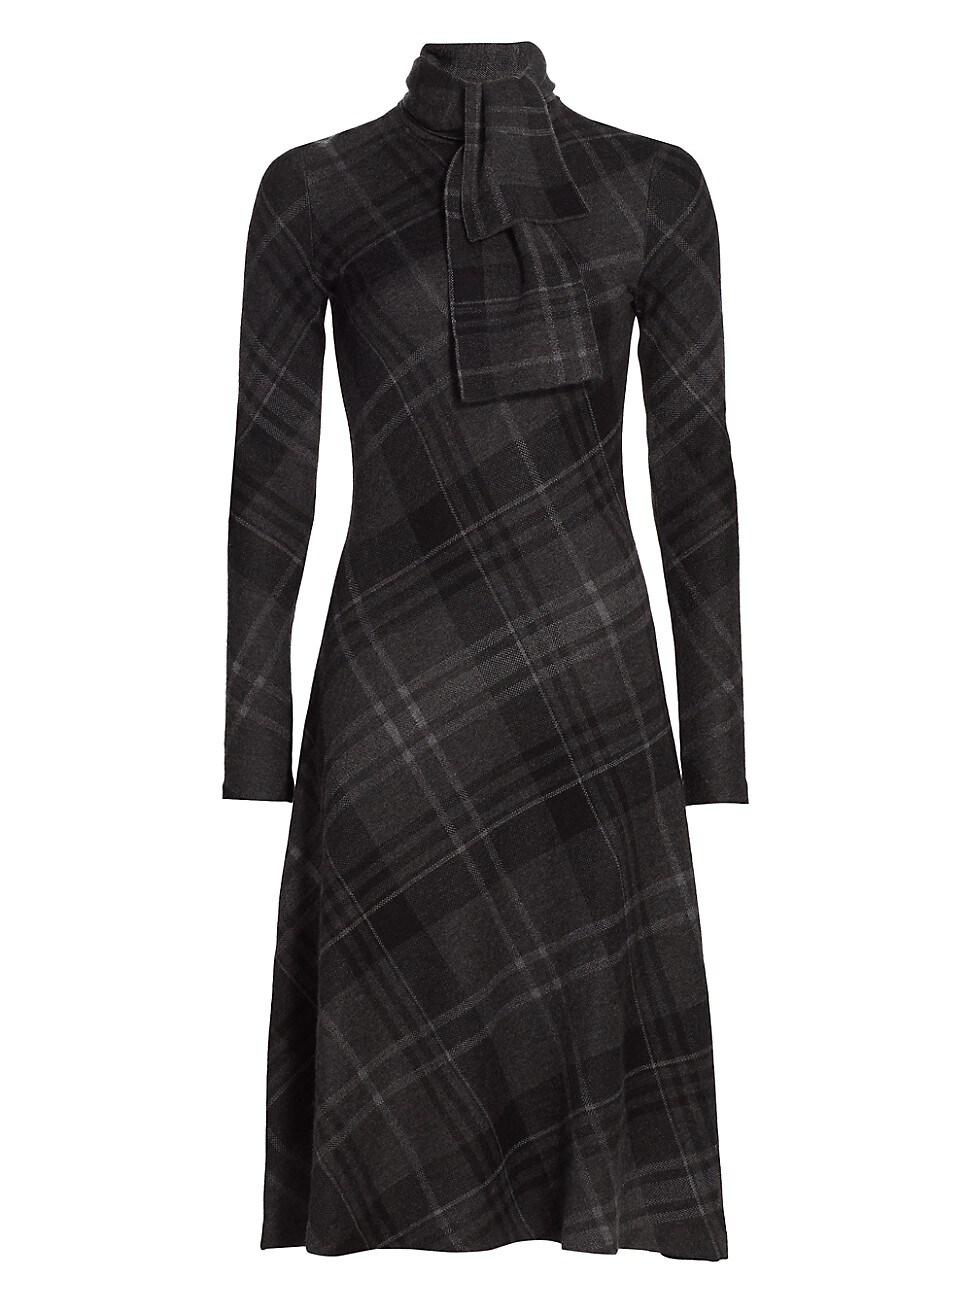 Ralph Lauren WOMEN'S SCARFNECK CASHMERE SWEATER DAY DRESS